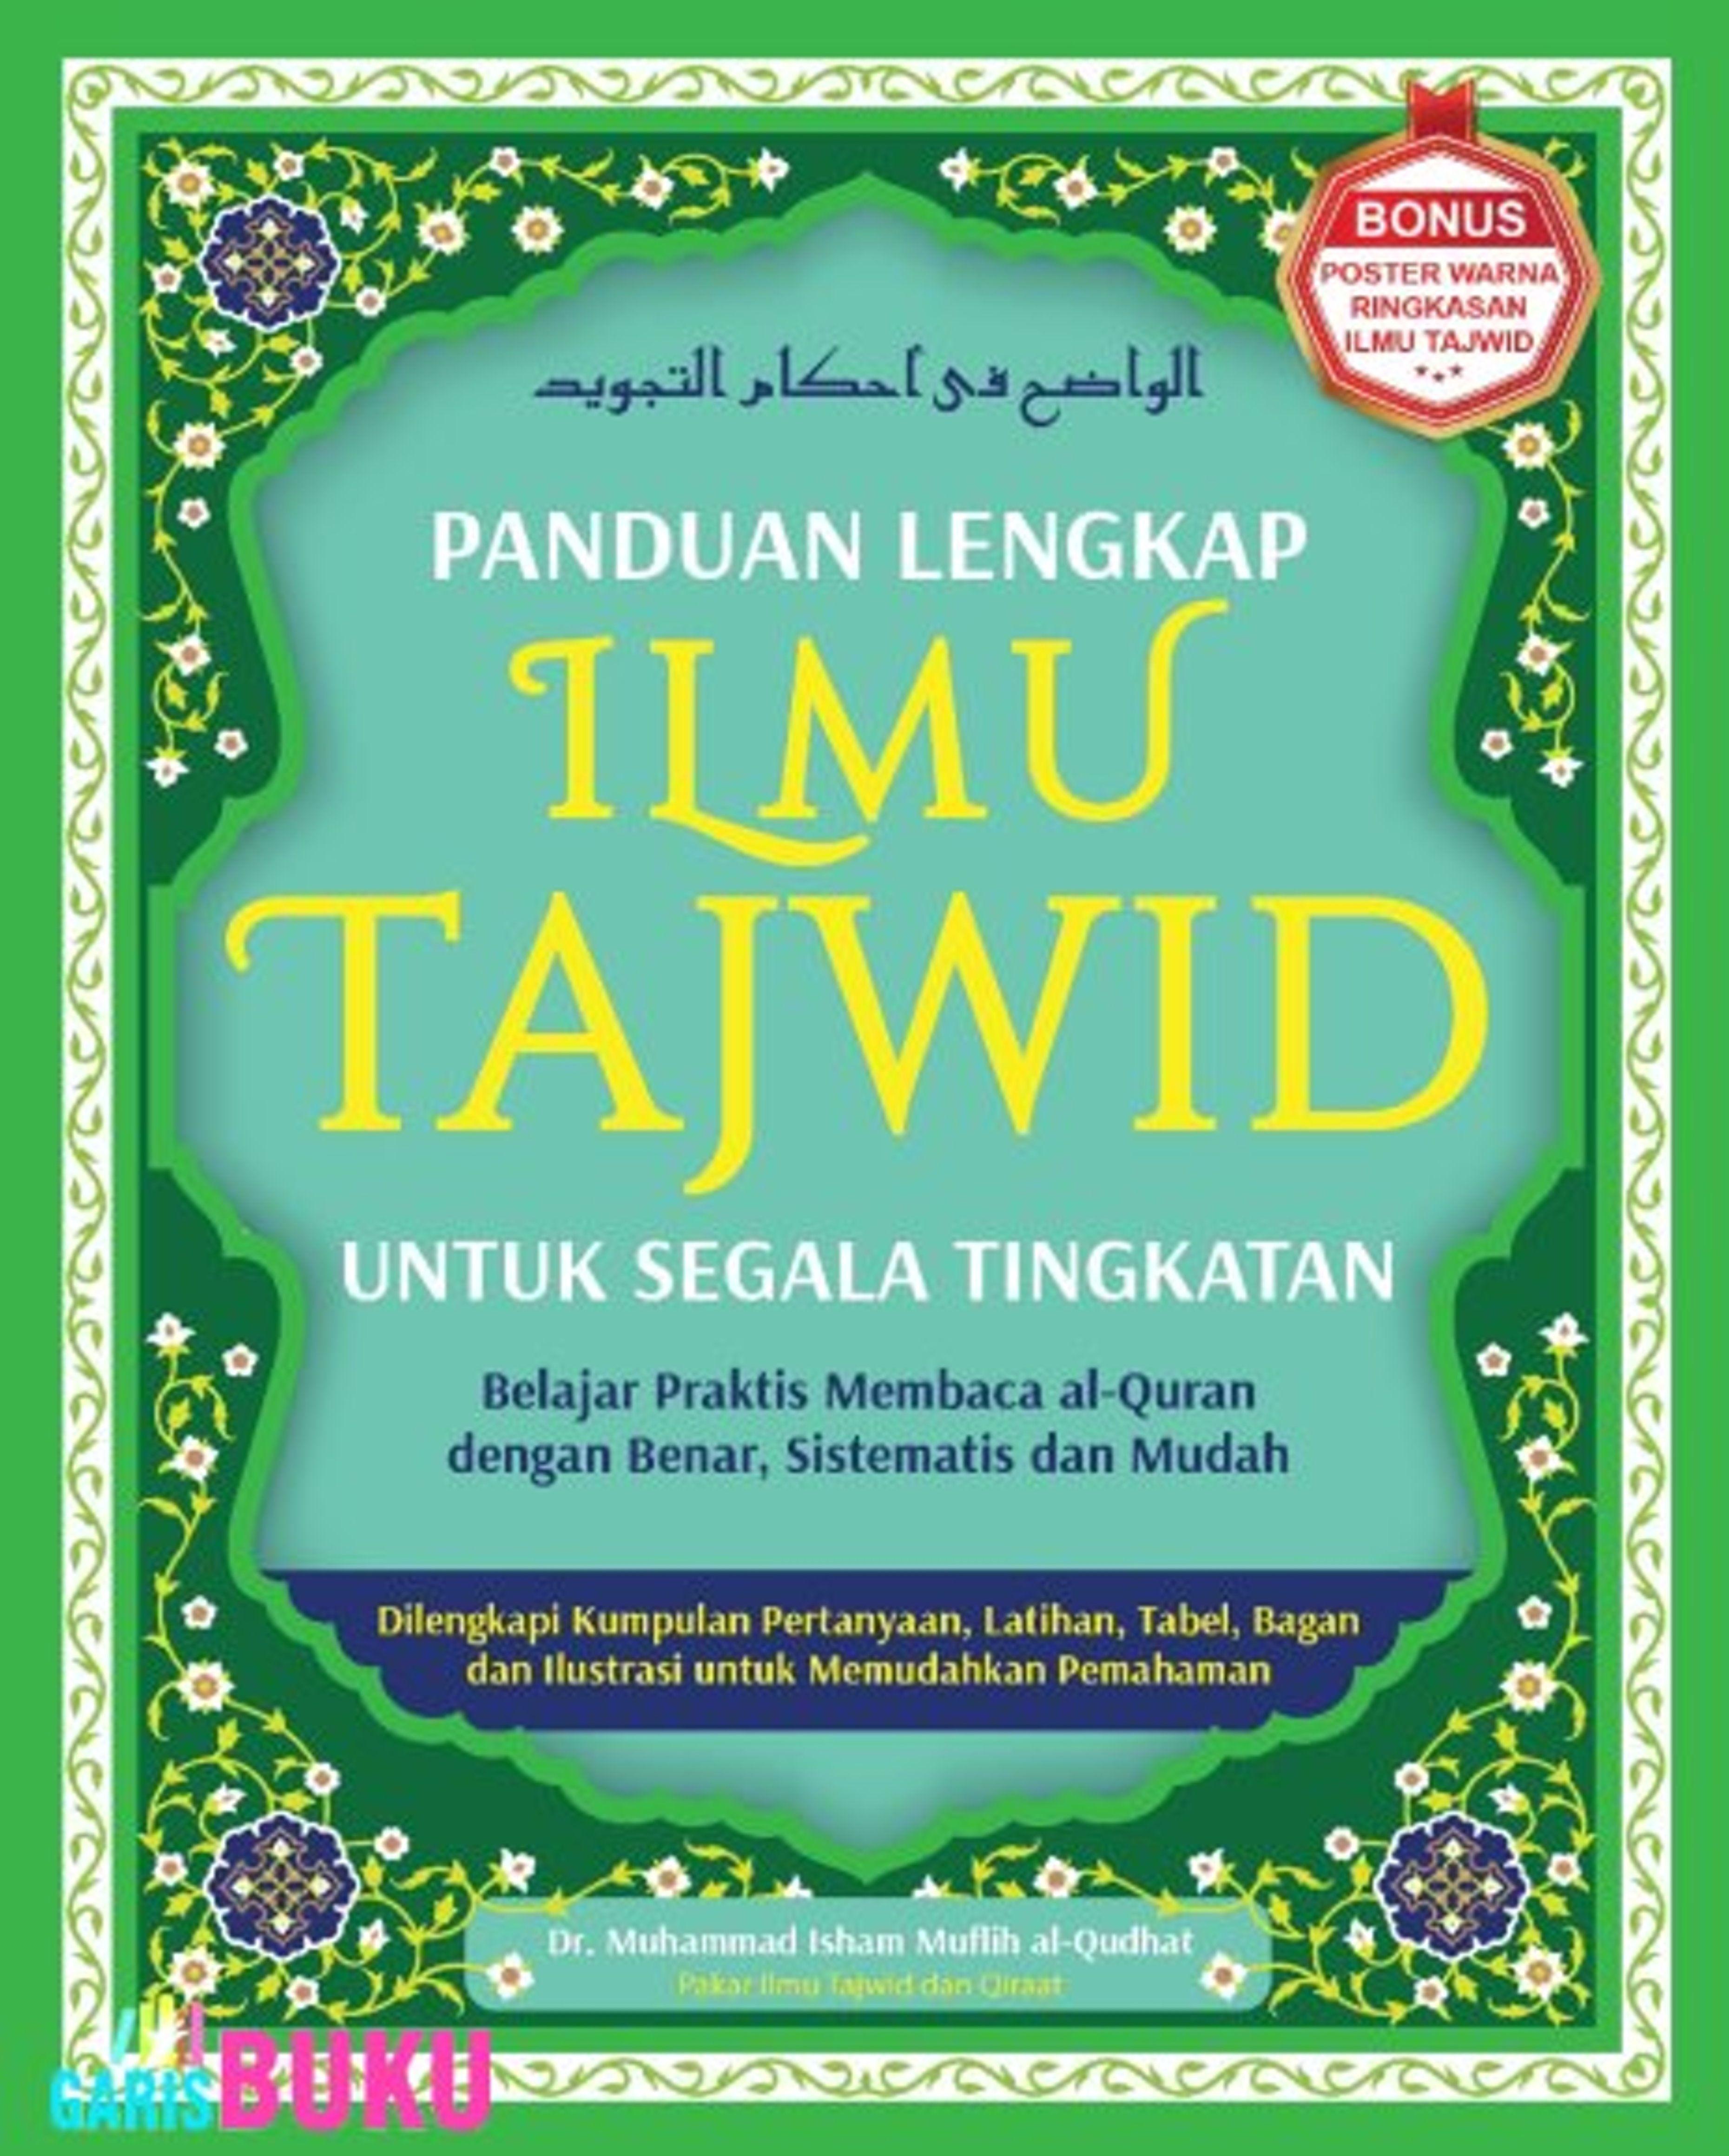 Panduan Lengkap Ilmu Tajwid Untuk Segala Tingkatan Belajar Membaca Al Quran Dengan Benar By Isham Membaca Quran Belajar